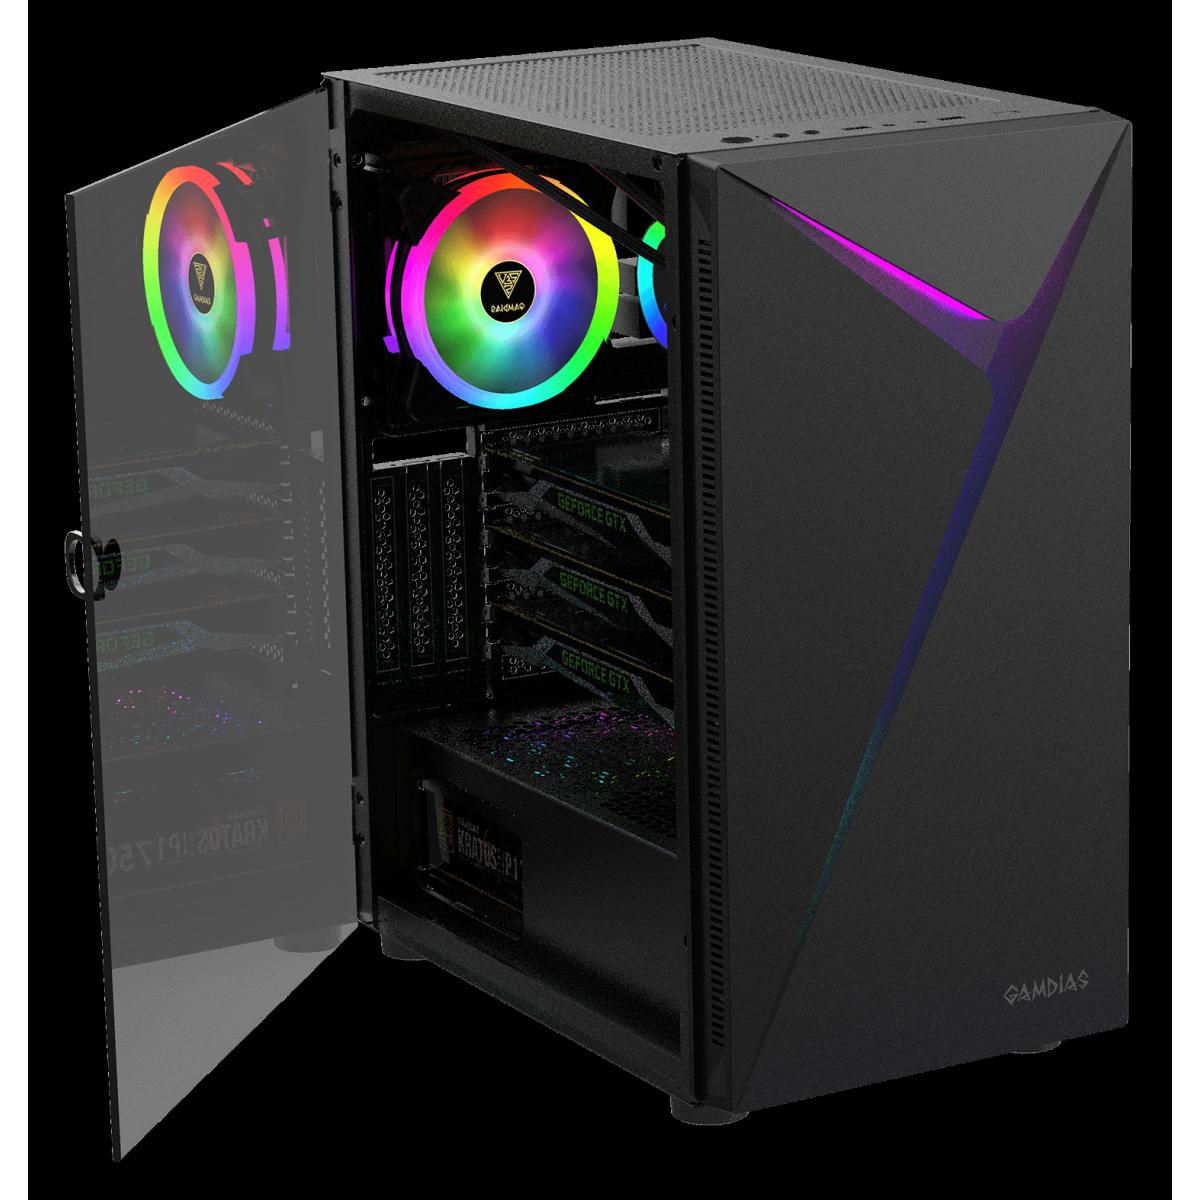 Gabinete Gamer Gamdias Argus E4 Elite, RGB, Mid Tower, Vidro Temperado, Black, Sem fonte, Com 1 Fan